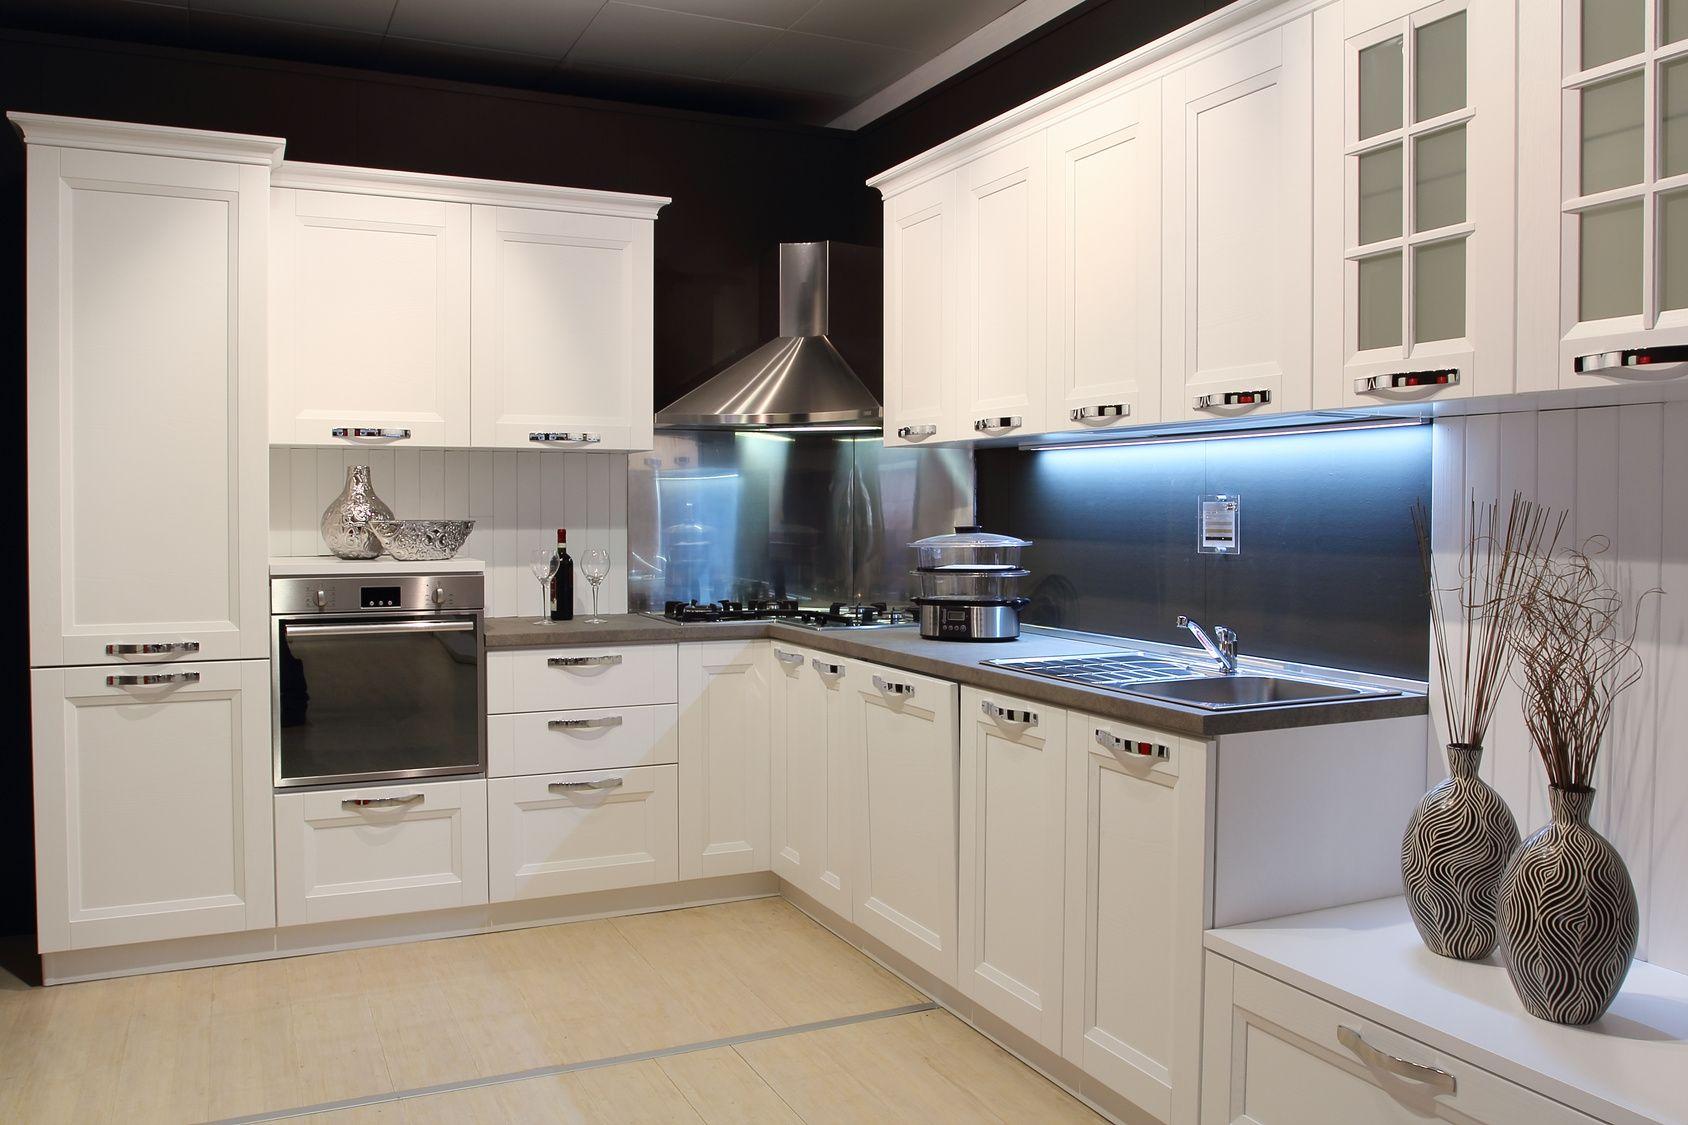 Küche Landhausstil L Form | Hängeschrank Wandschrank Wandkonsole ...